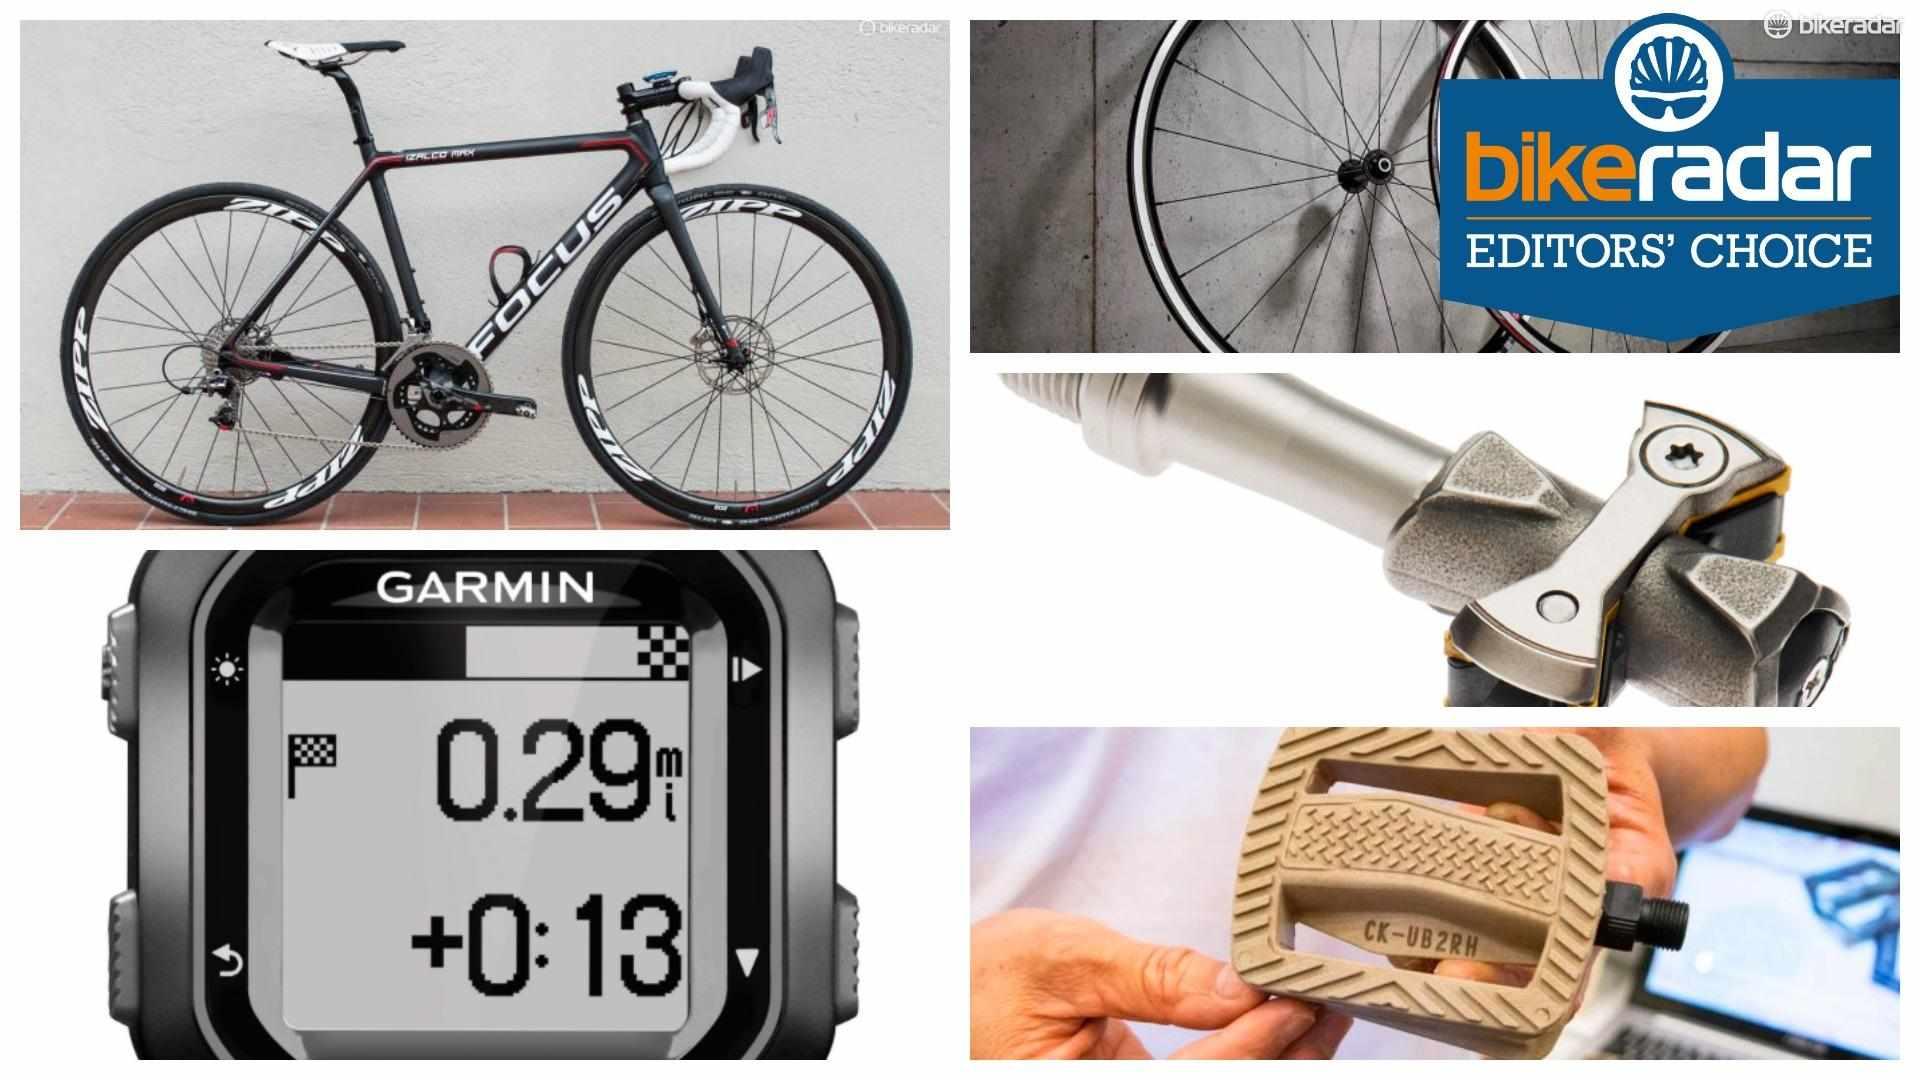 Matthew Allen's BikeRadar Gear of the Year 2015